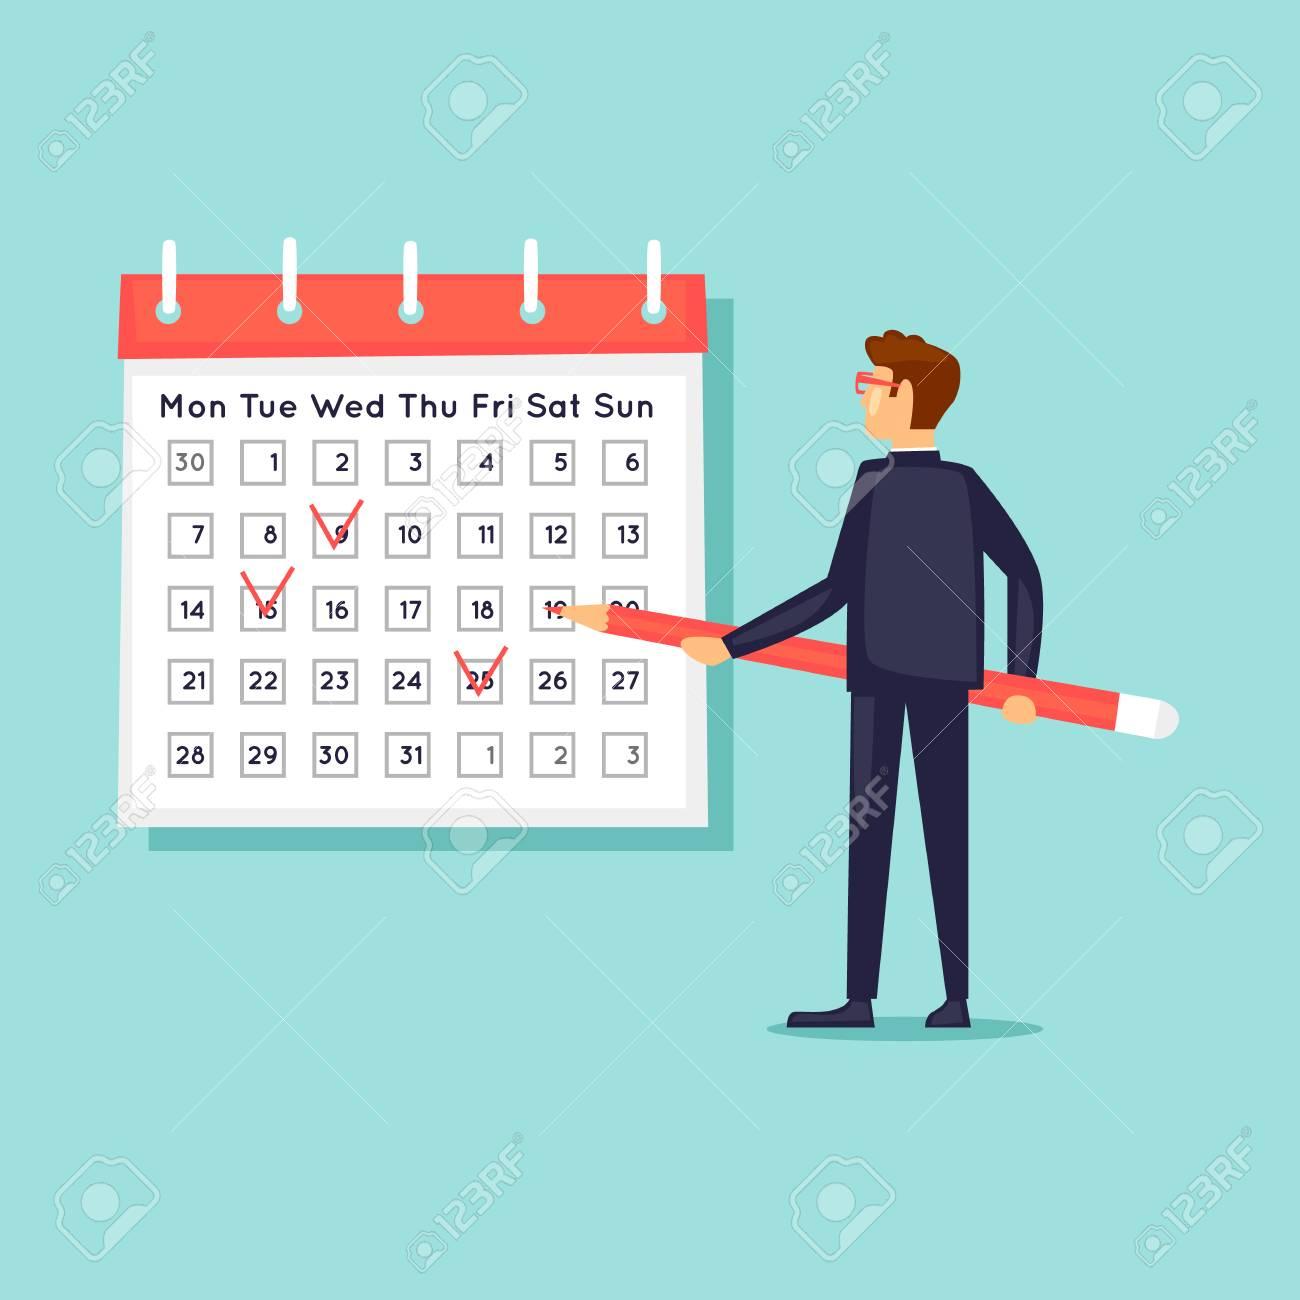 Calendar, Businessman Notes The Date. Flat Design Vector Illustration. inside Calendar Flat Design